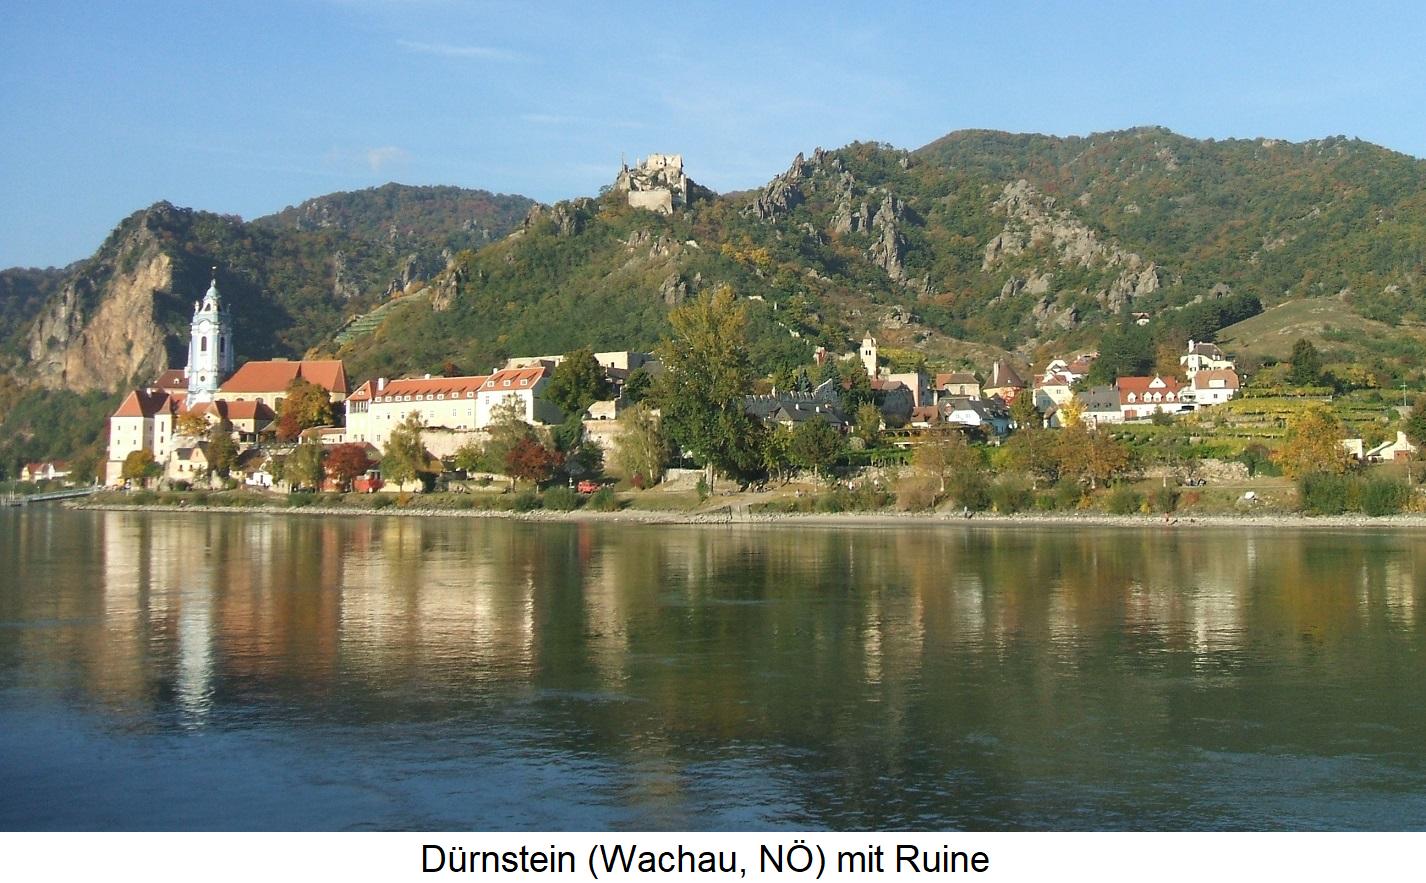 Dürnstein with ruin (Wachau)